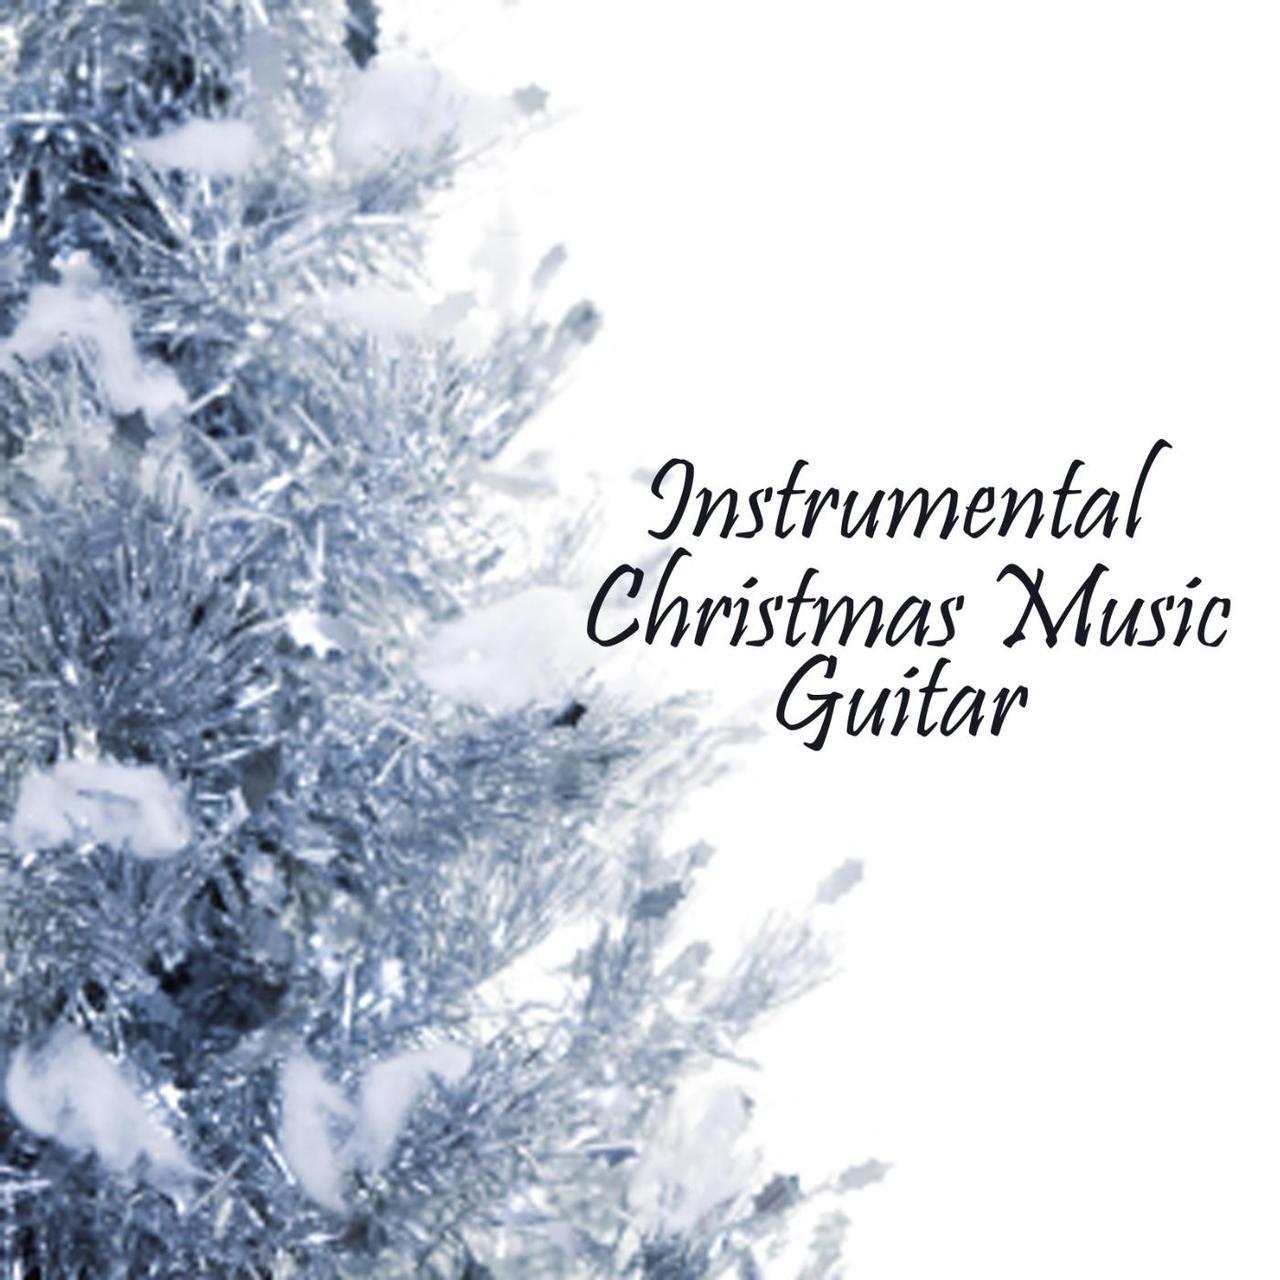 TIDAL: Listen to Instrumental Christmas Music - Relaxing Christmas ...